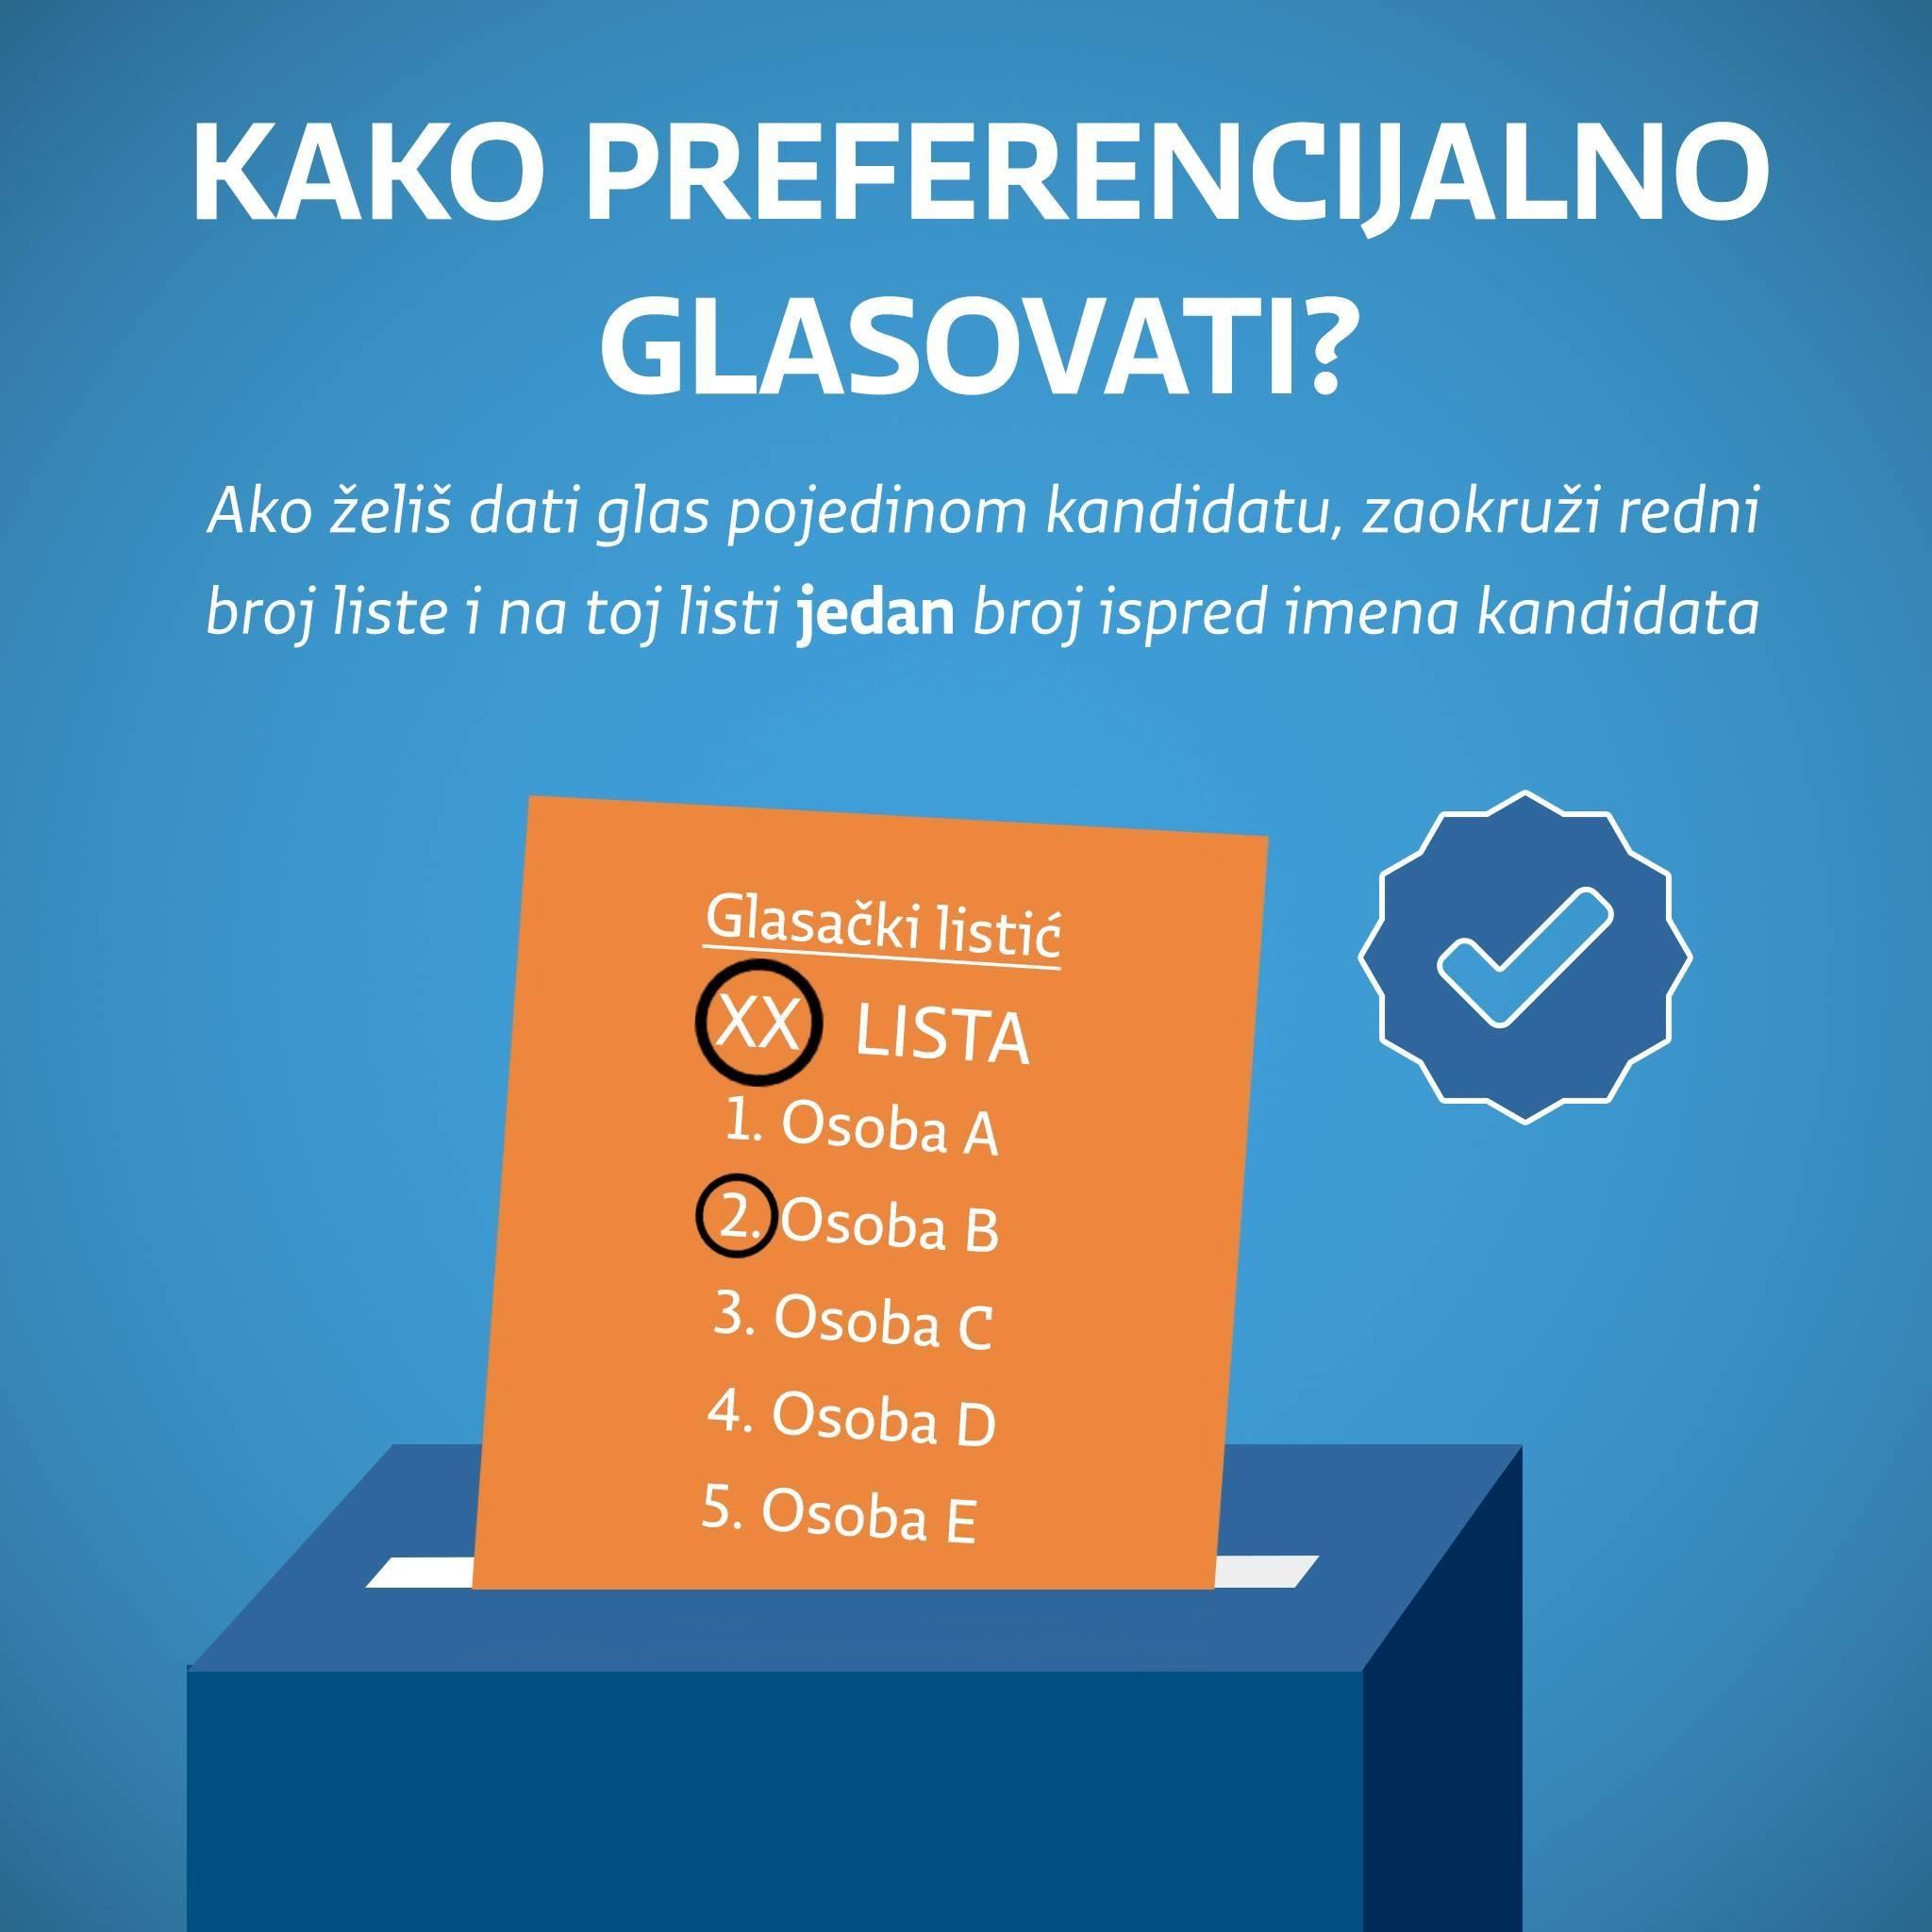 Saznaj kako preferencijalno glasovati